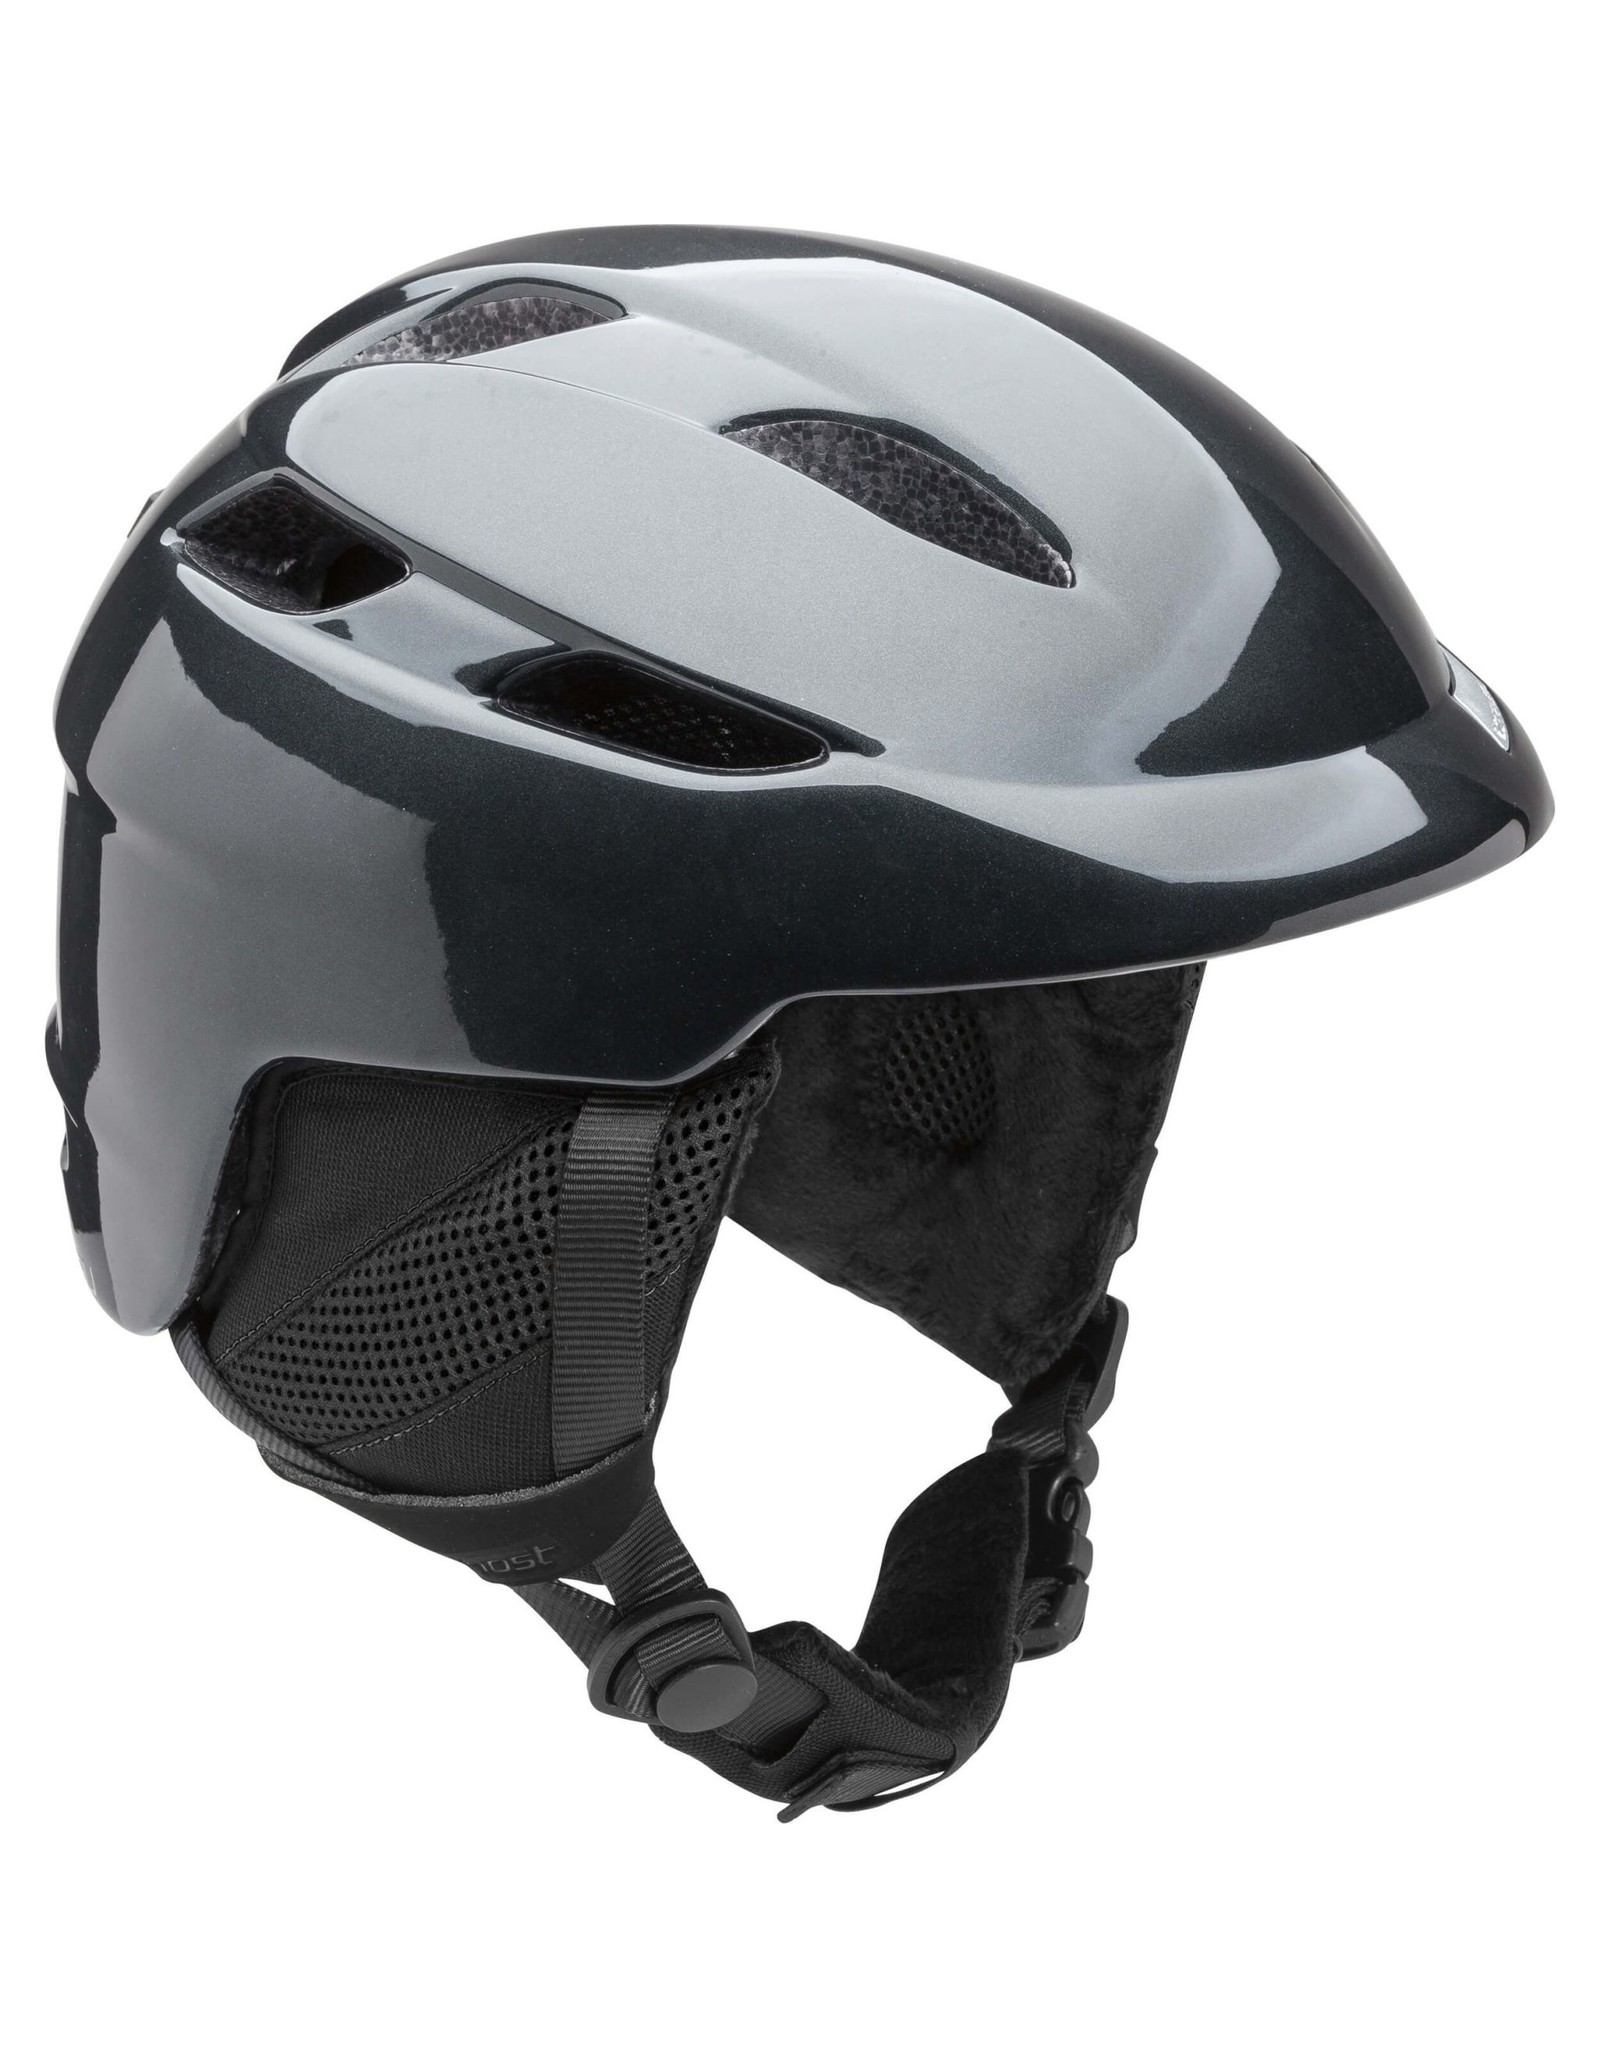 Garneau Helmet Garneau Ghost Mips Fatbike